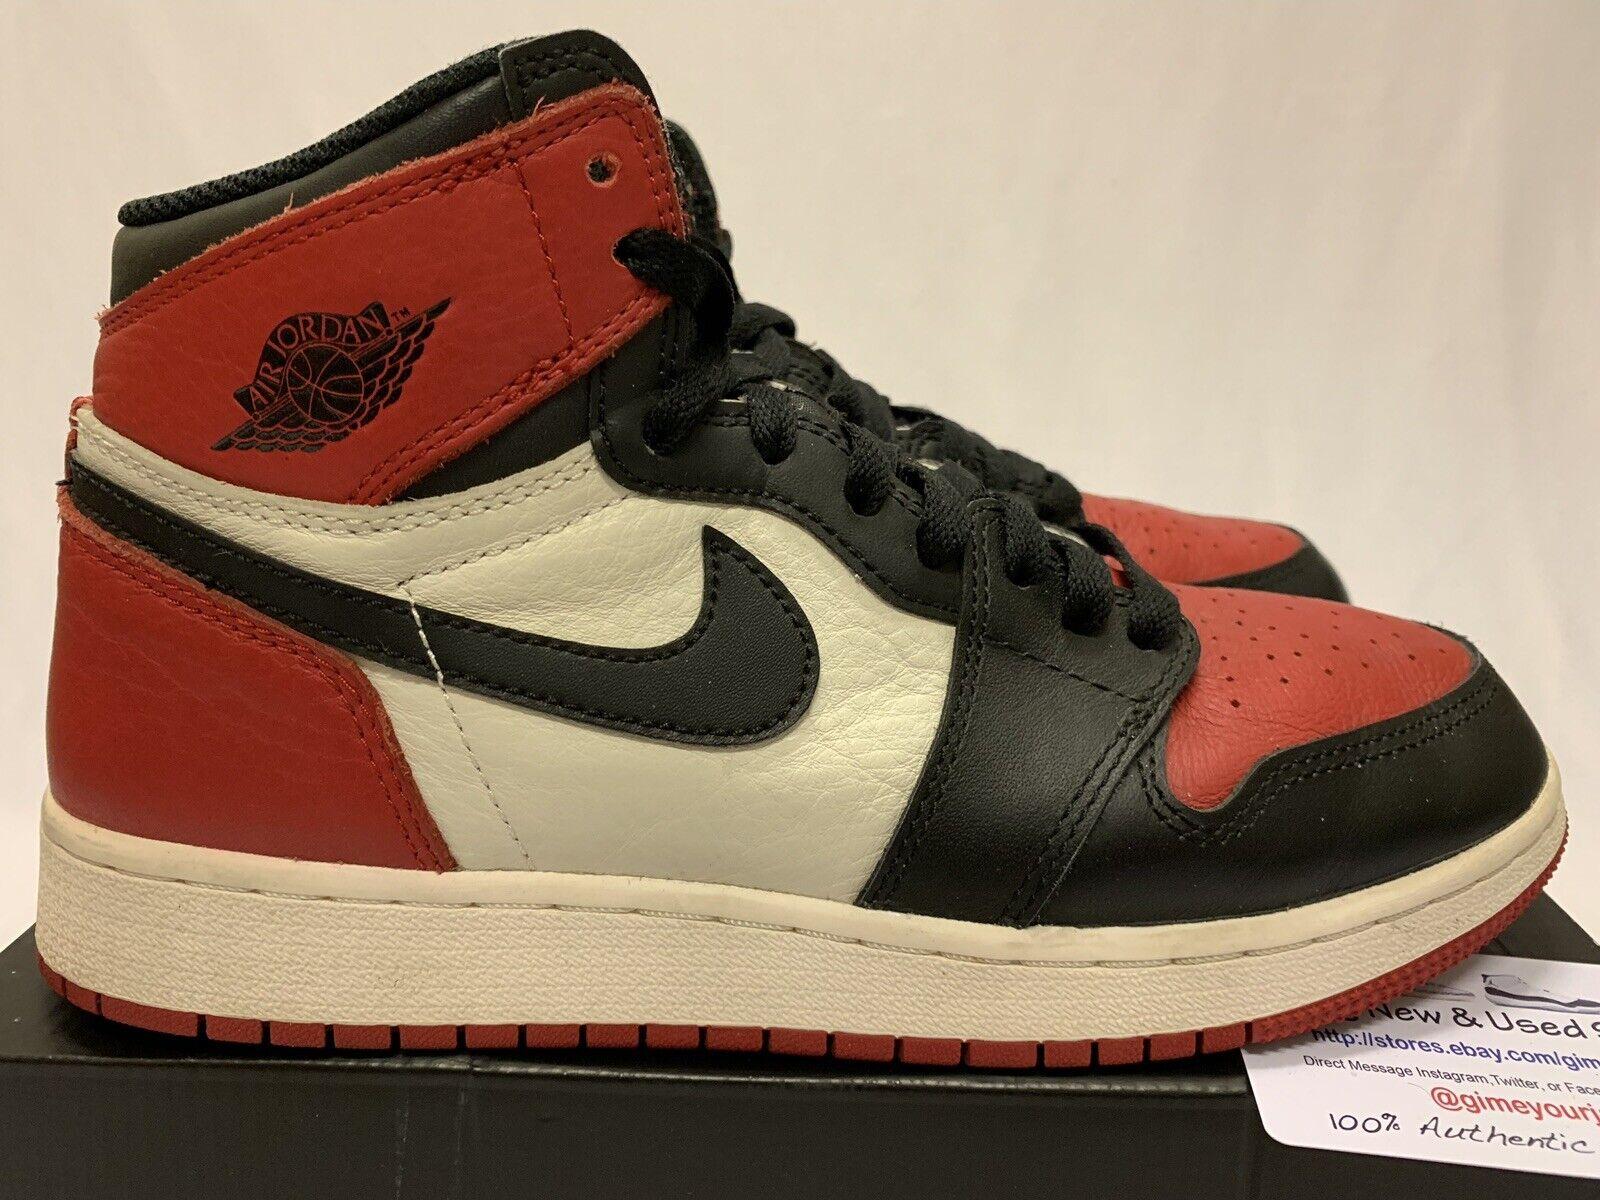 Air Jordan 1 Retro High OG BG Bred Toe Size 6.5y Black Varsity Red 575441-610